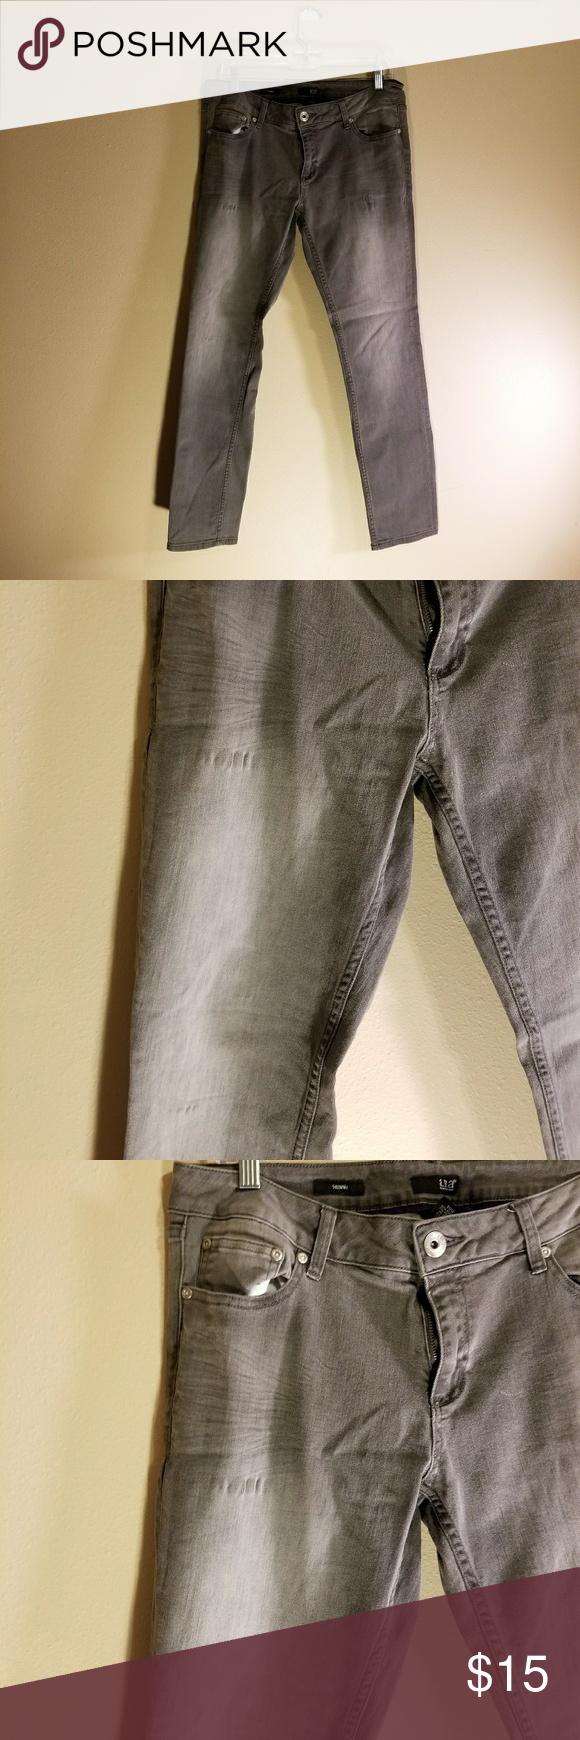 a6d8e2b944668 ANA gray skinny jeans